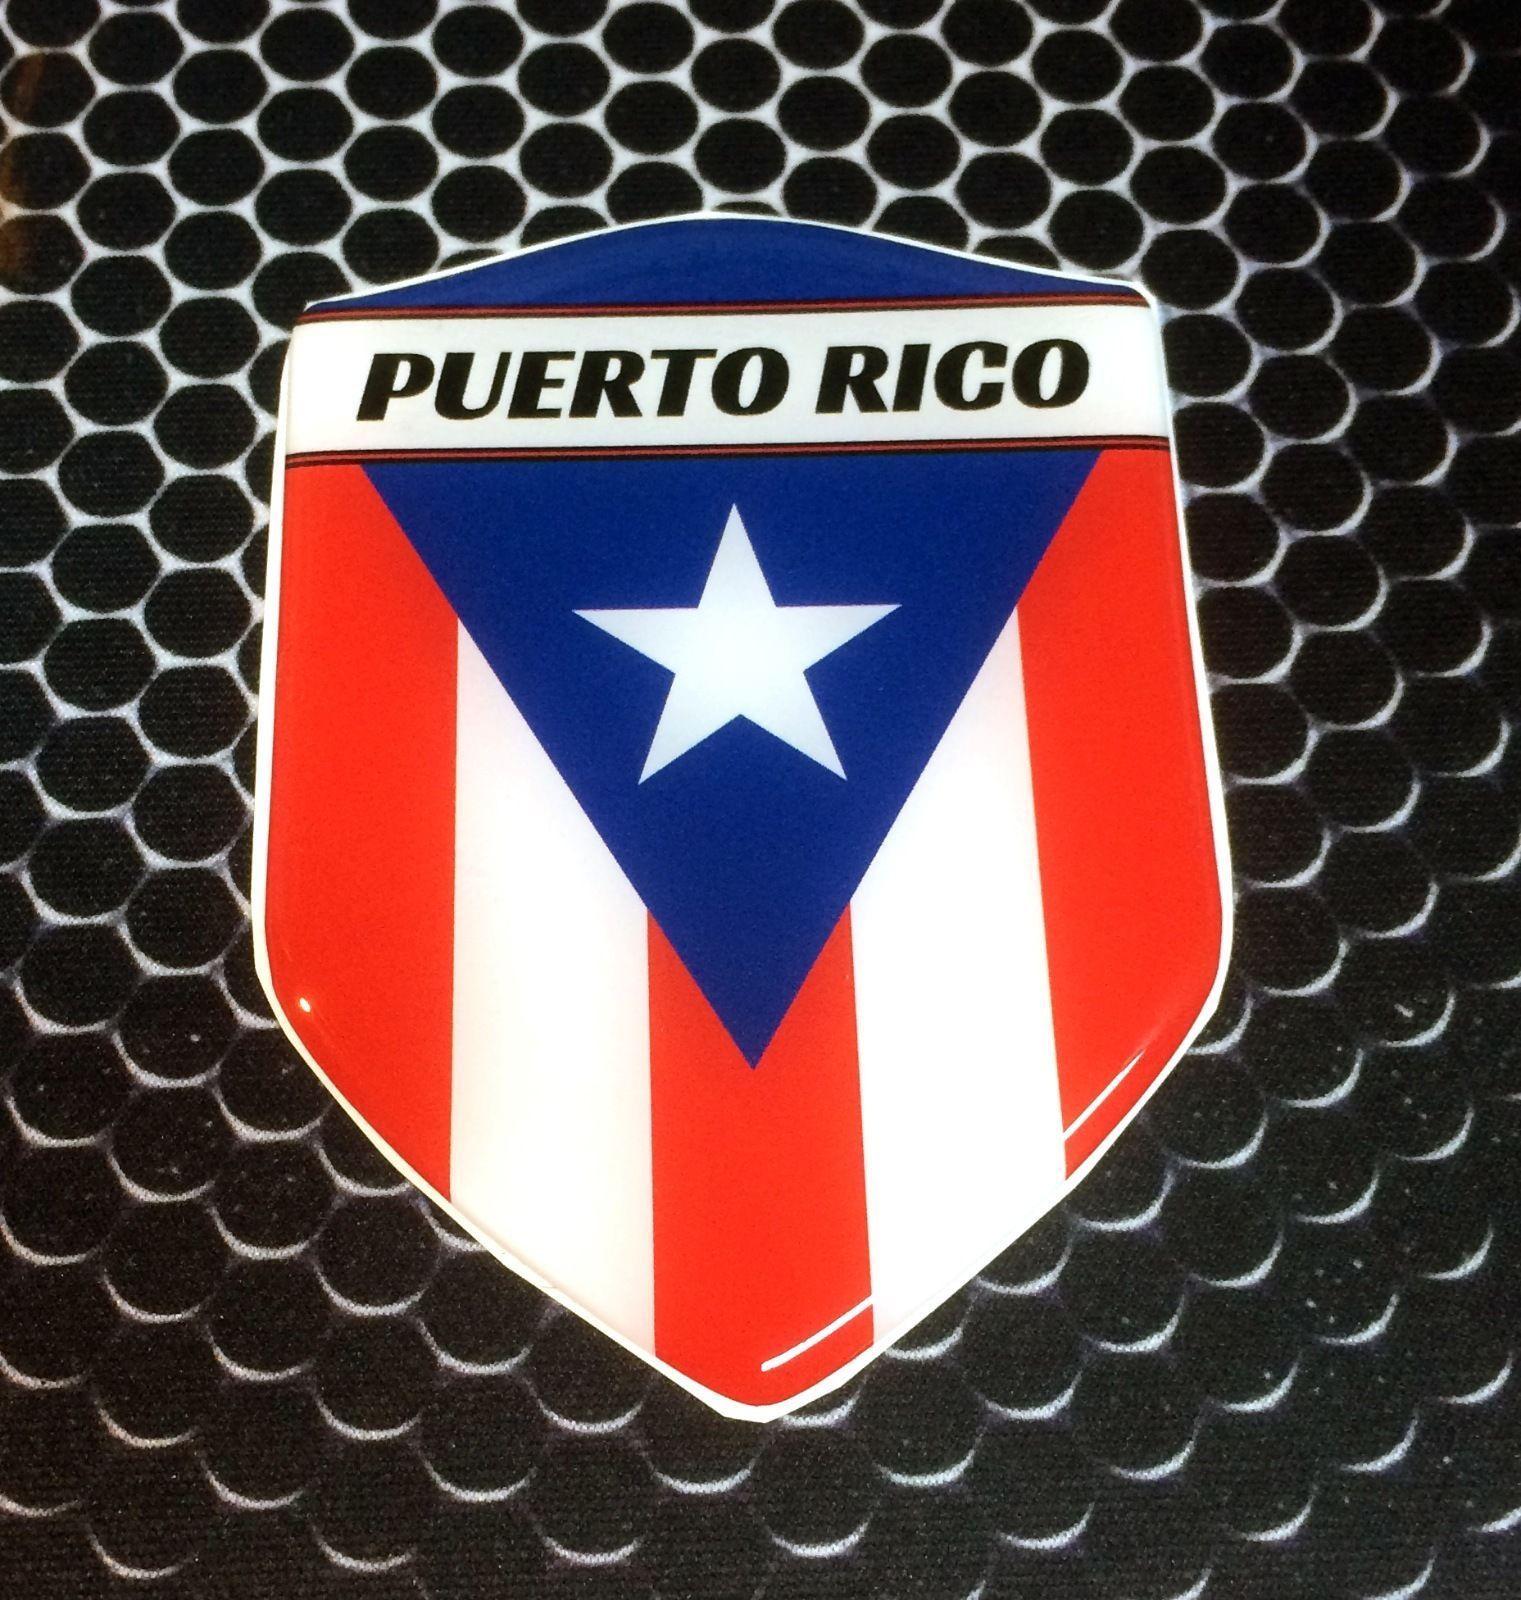 Puerto Rico Splash with flag Decal Sticker